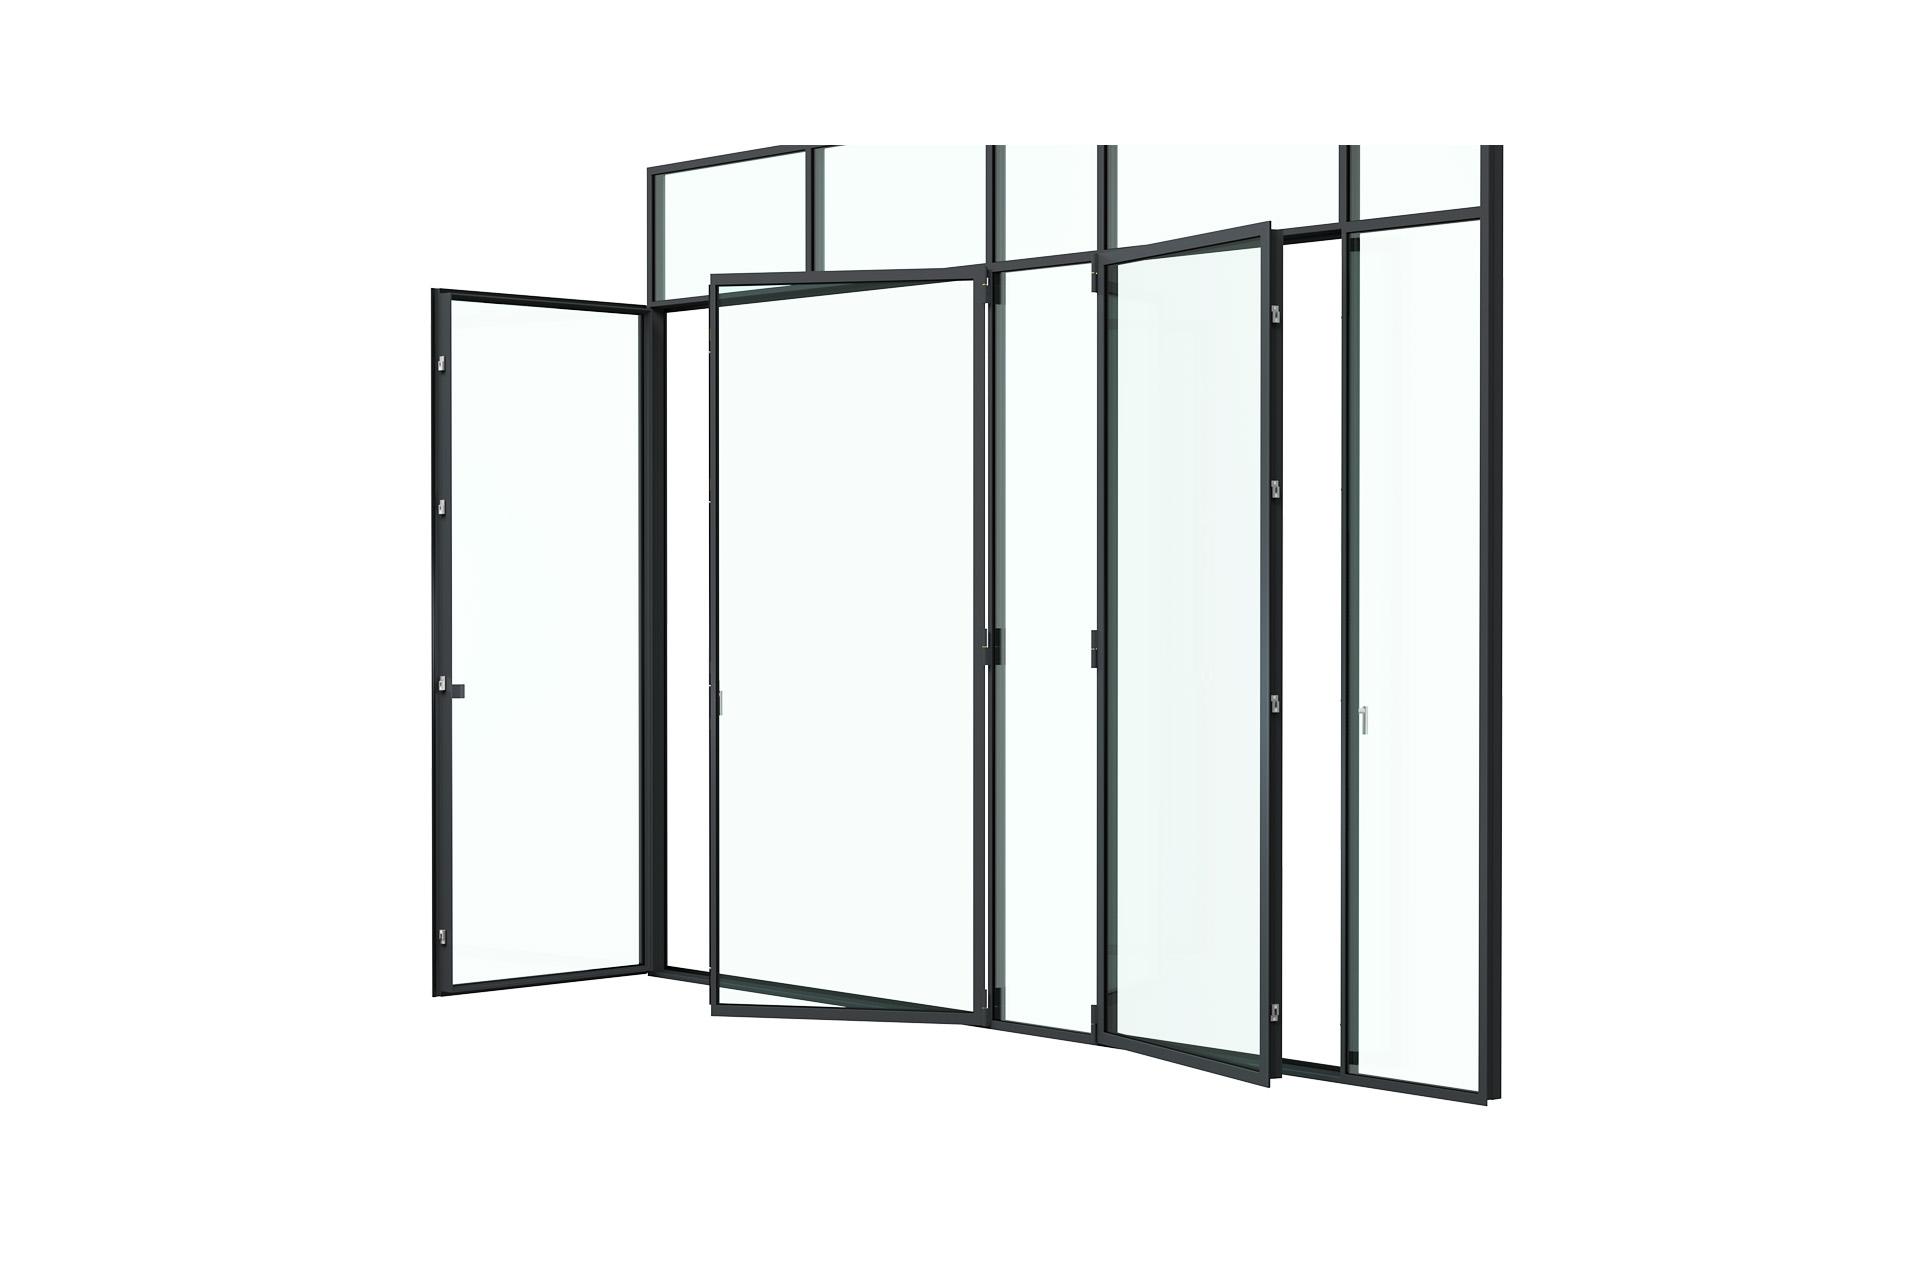 3d rendering side view of MHB steel French doors